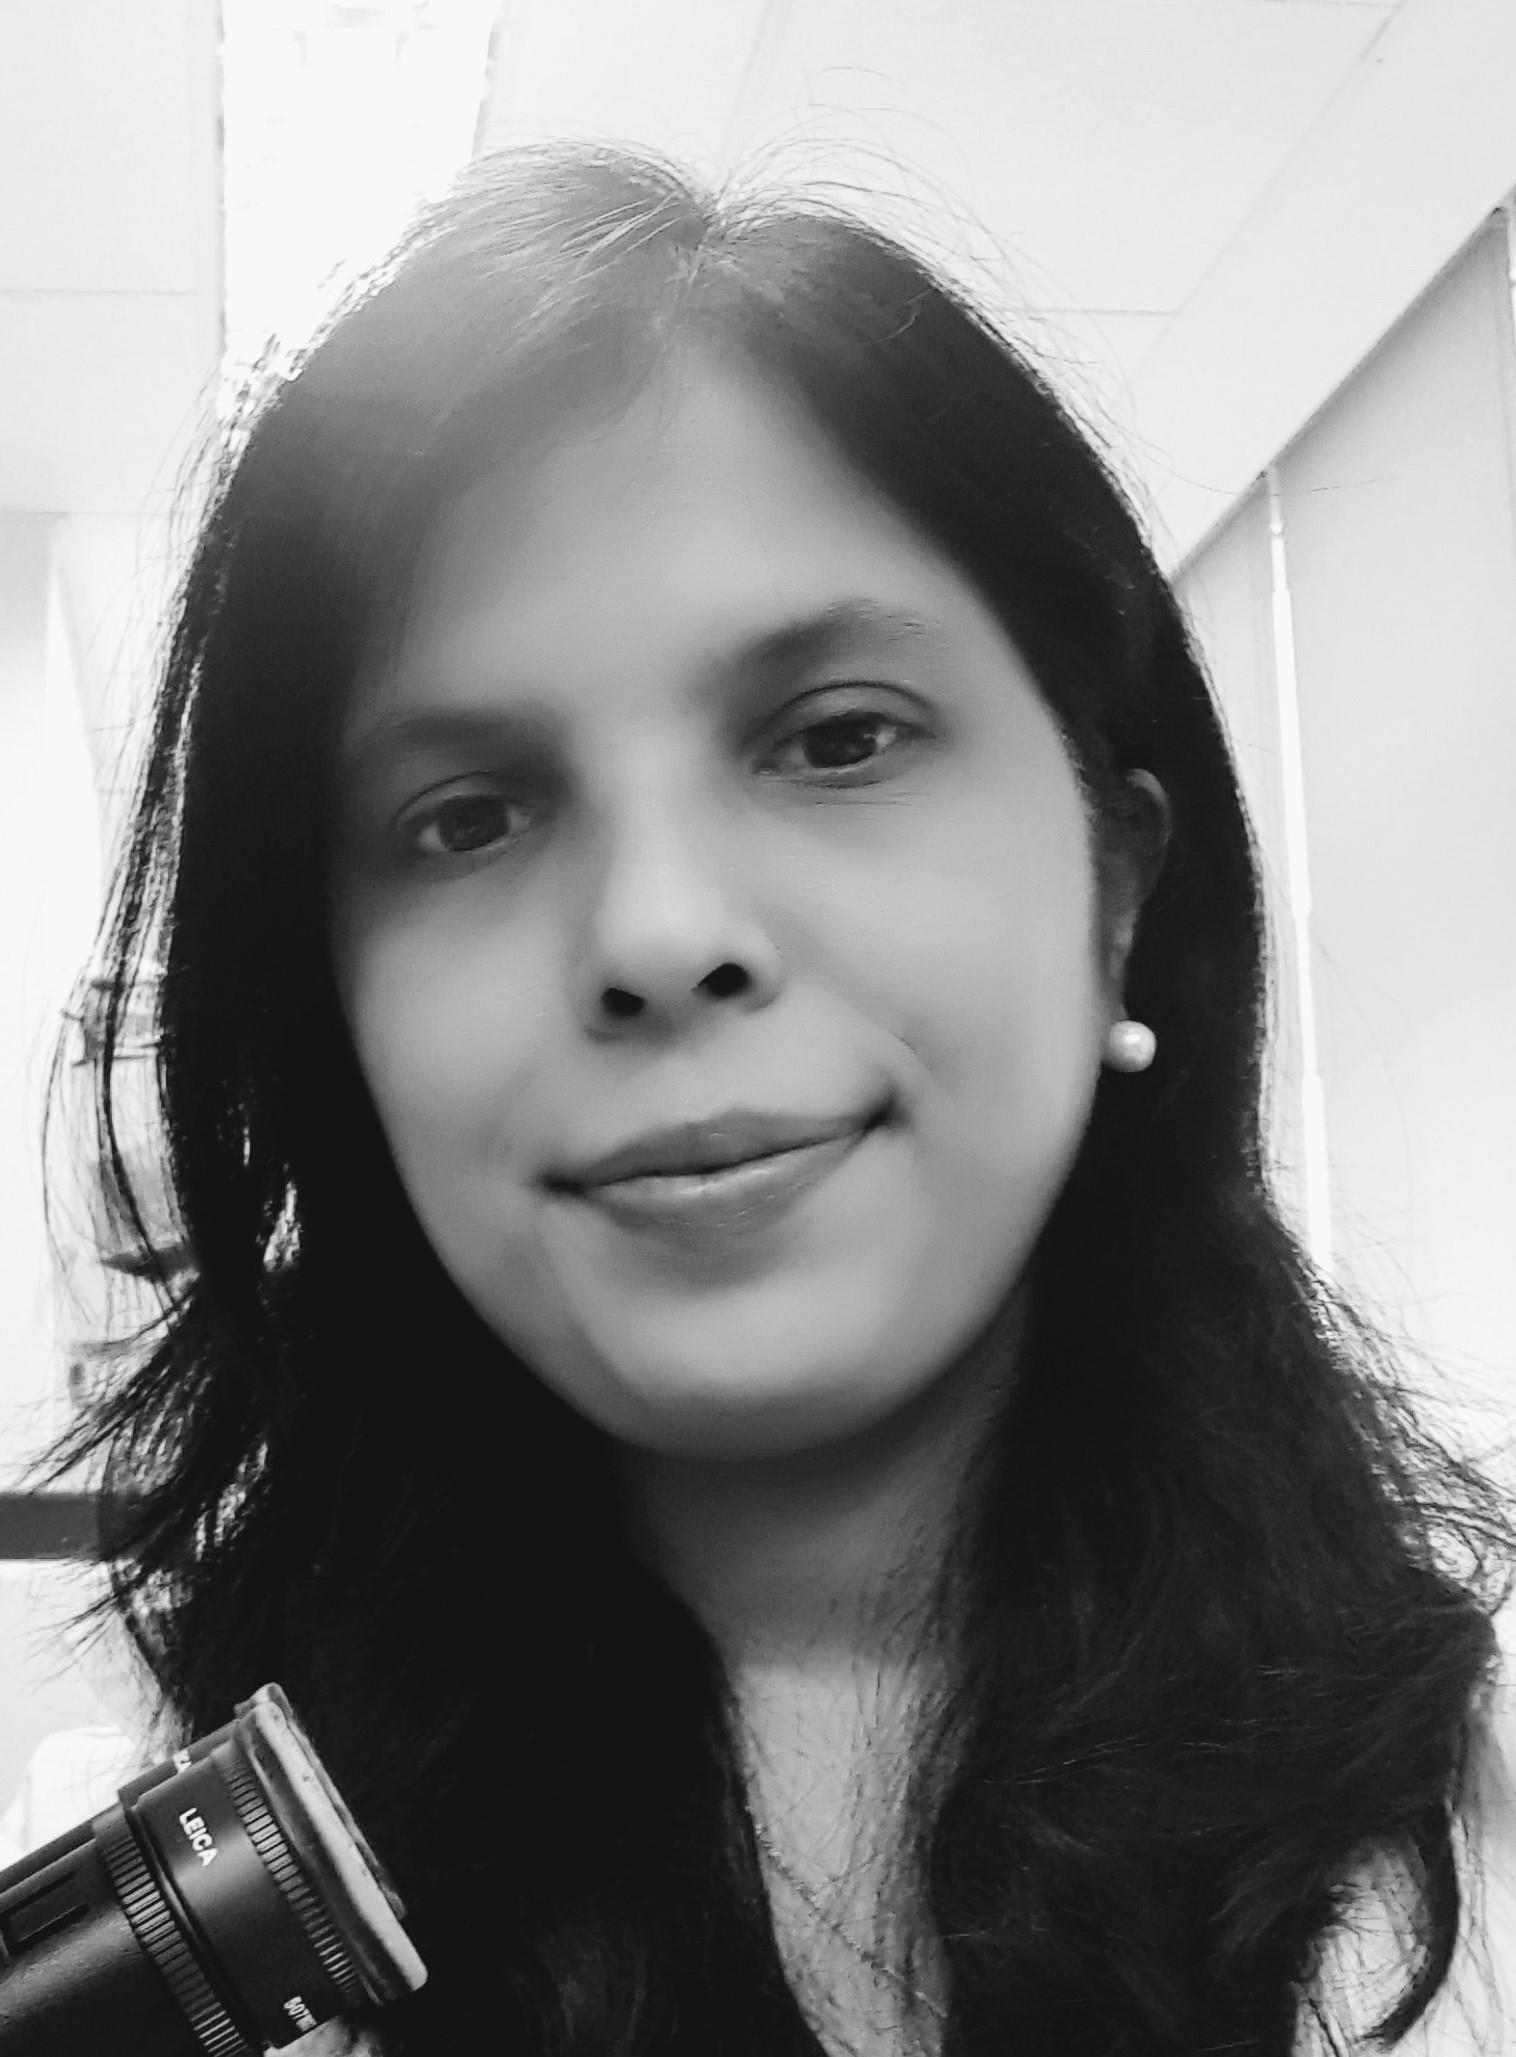 Supriya Srivastava M.D., Ph.D.